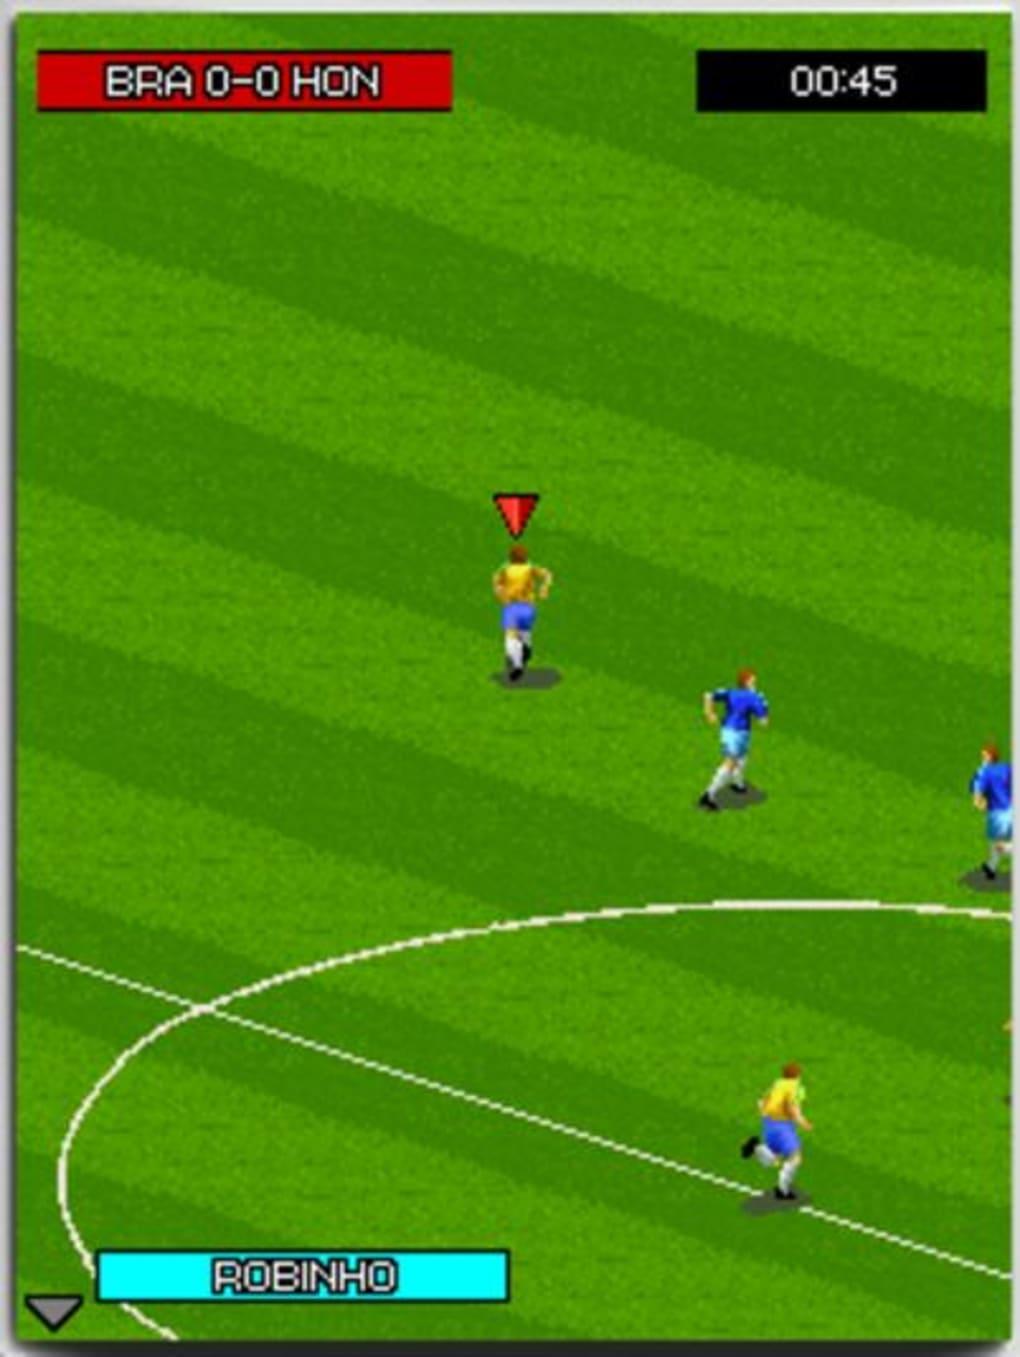 Donload Game Sport 320*240 S40 jar - buddywemo's blog